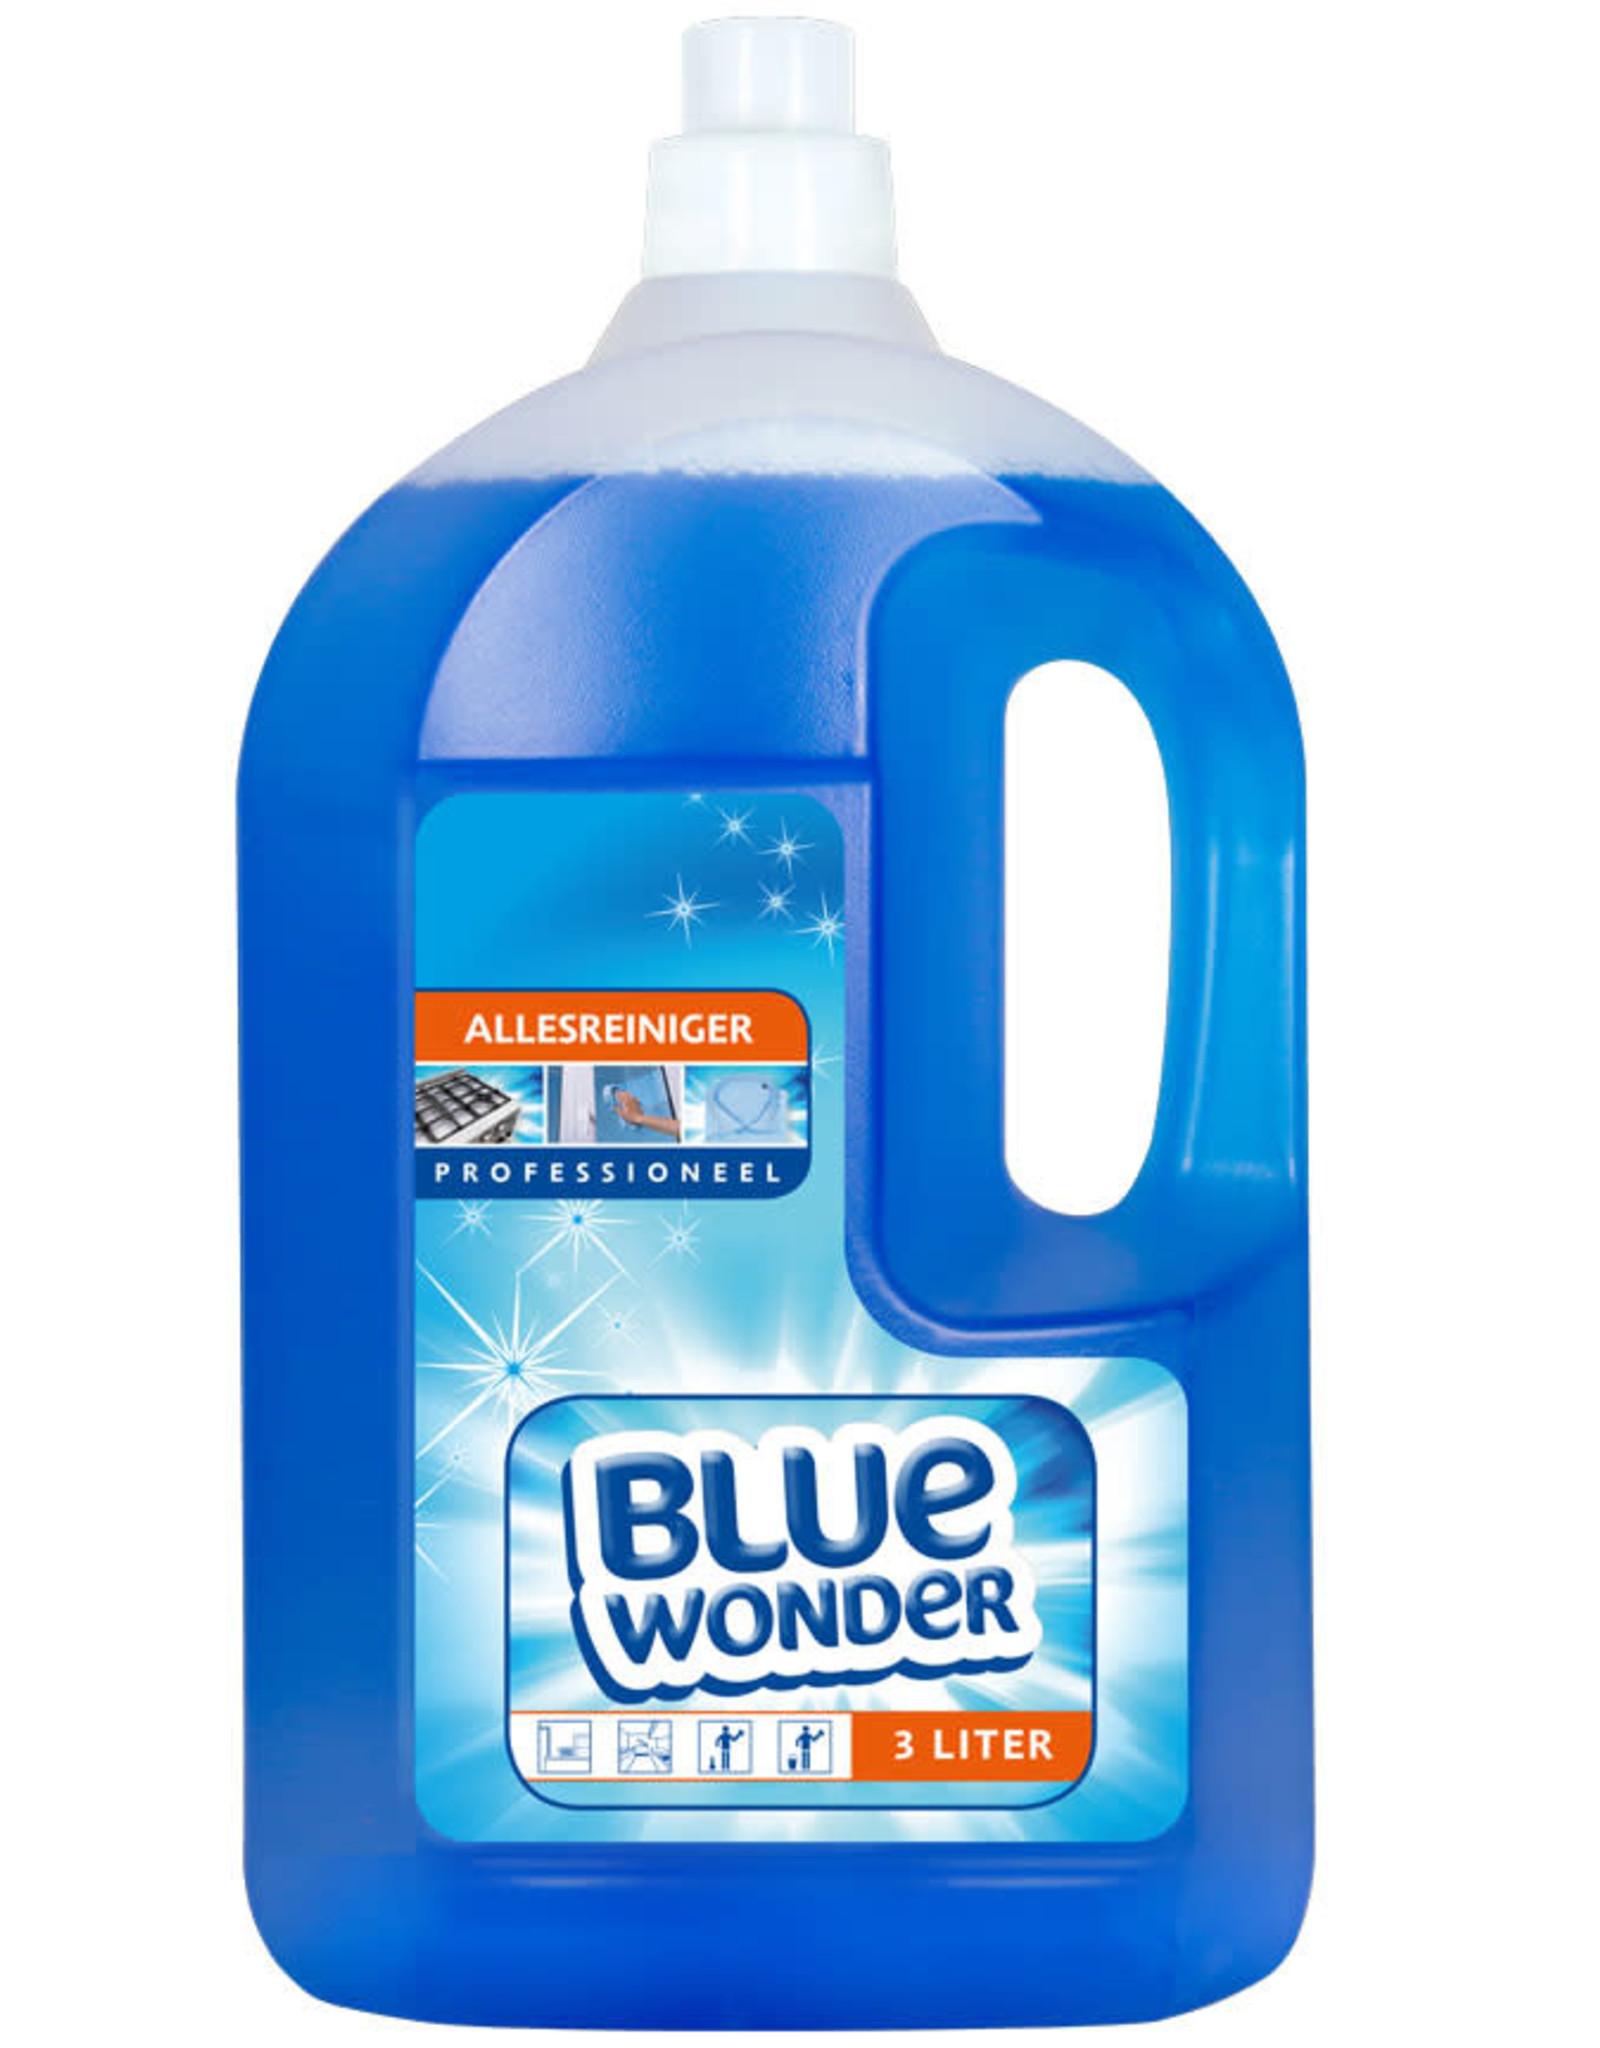 Blue Wonder Blue Wonder Professioneel Alles-reiniger Dop 4x 3000 ml omdoos